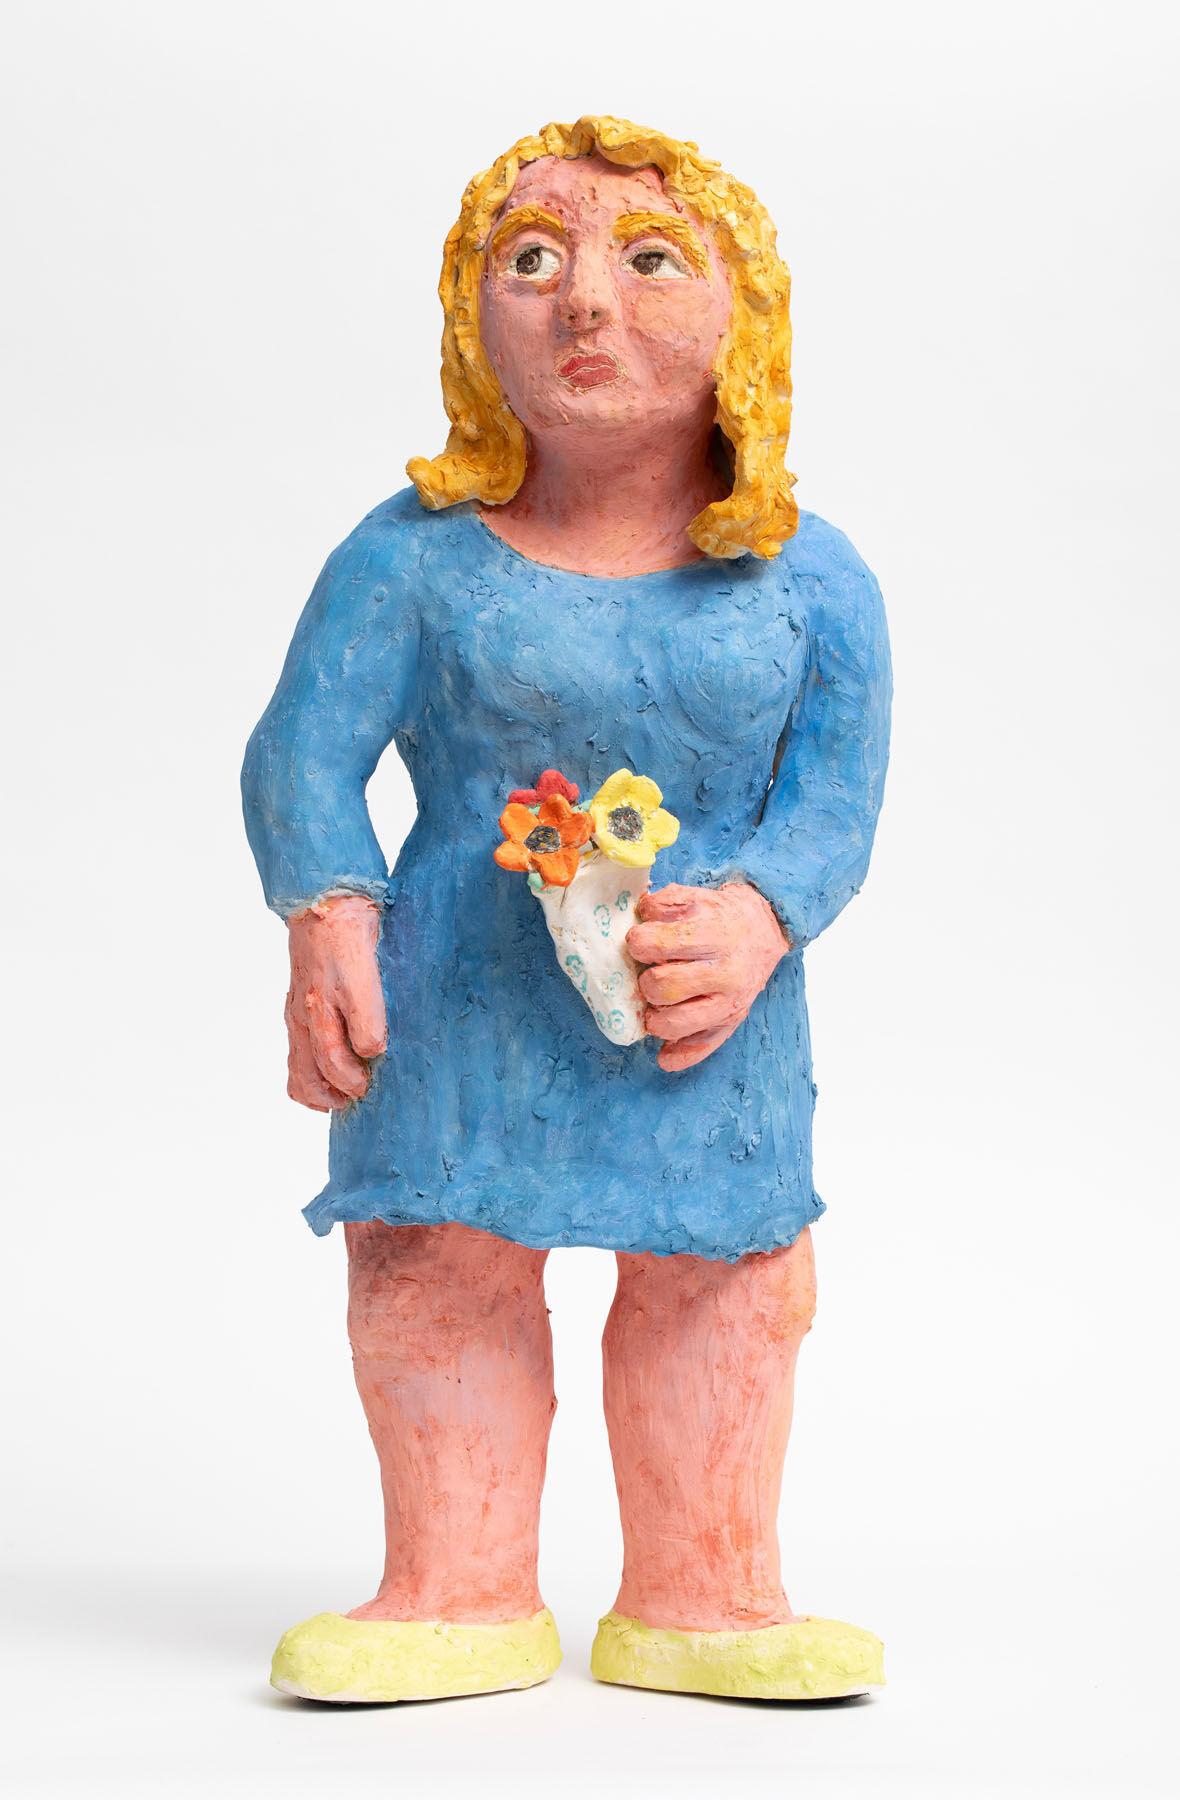 Sally Saul, Blue Lady, 2018. Courtesy of the artist and Rachel Uffner Gallery.